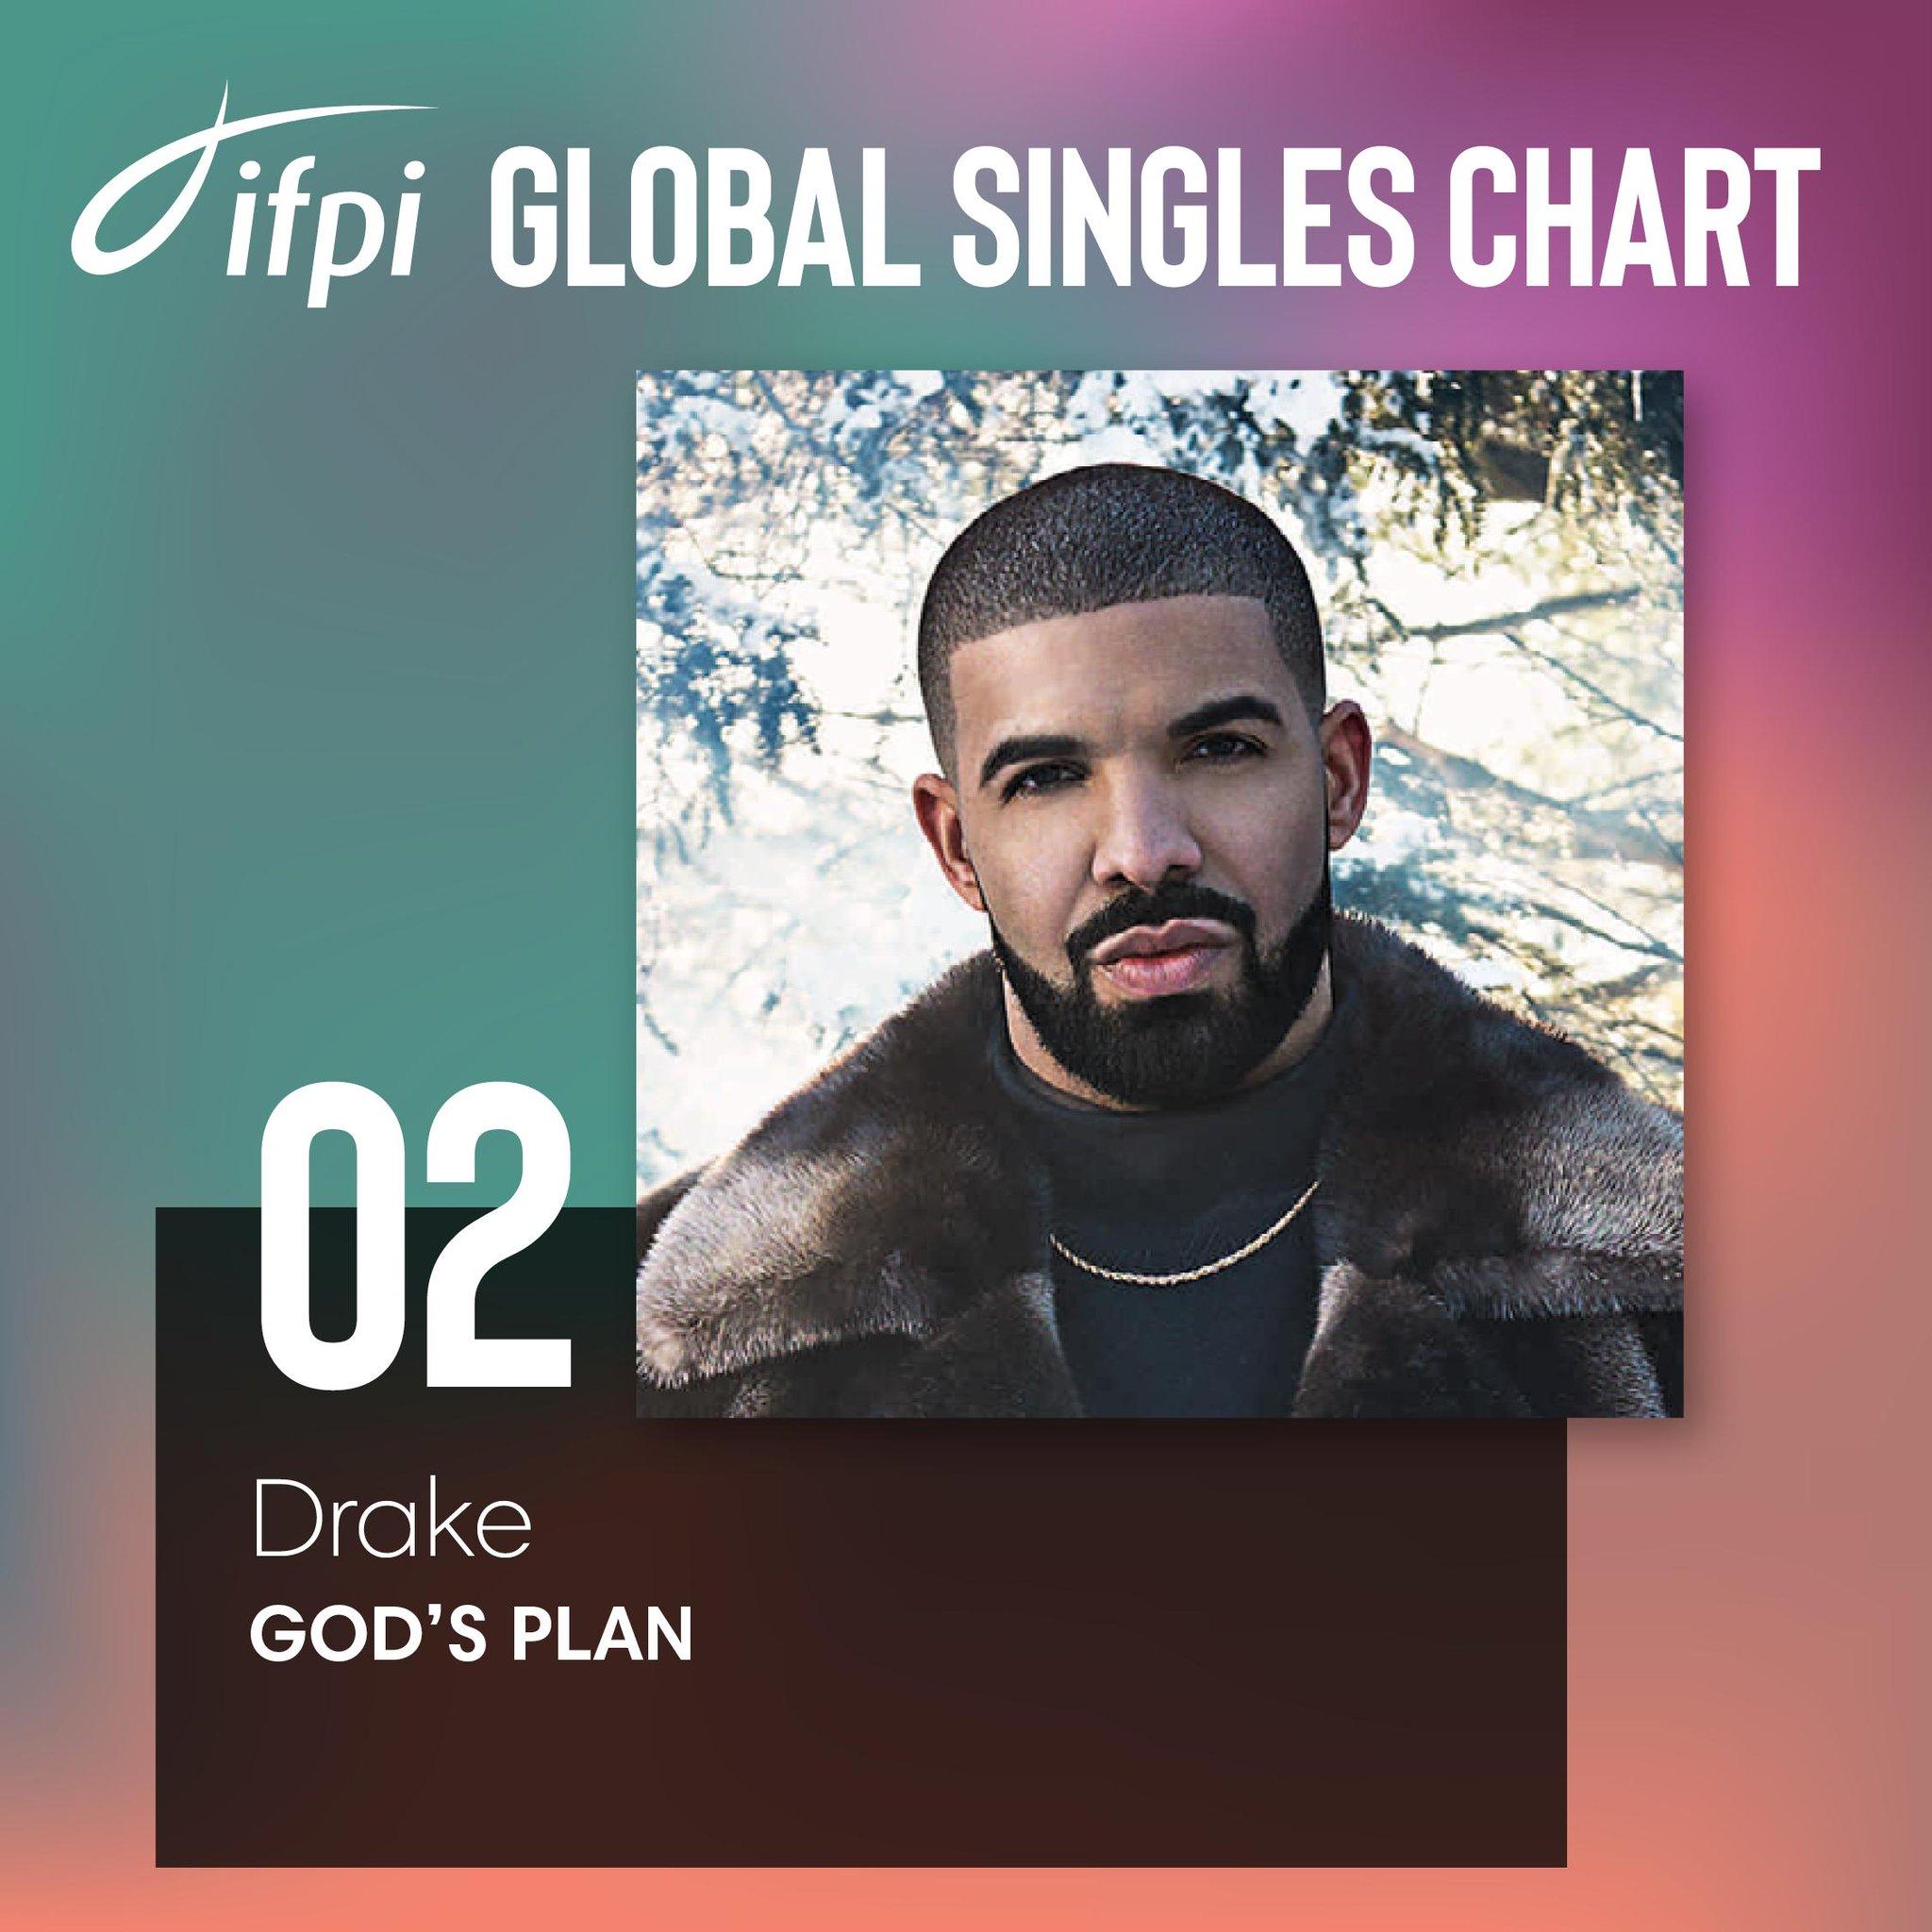 IFPI Top Selling Singles 2018 02 - Топ-10 самых продаваемых песен 2018 года